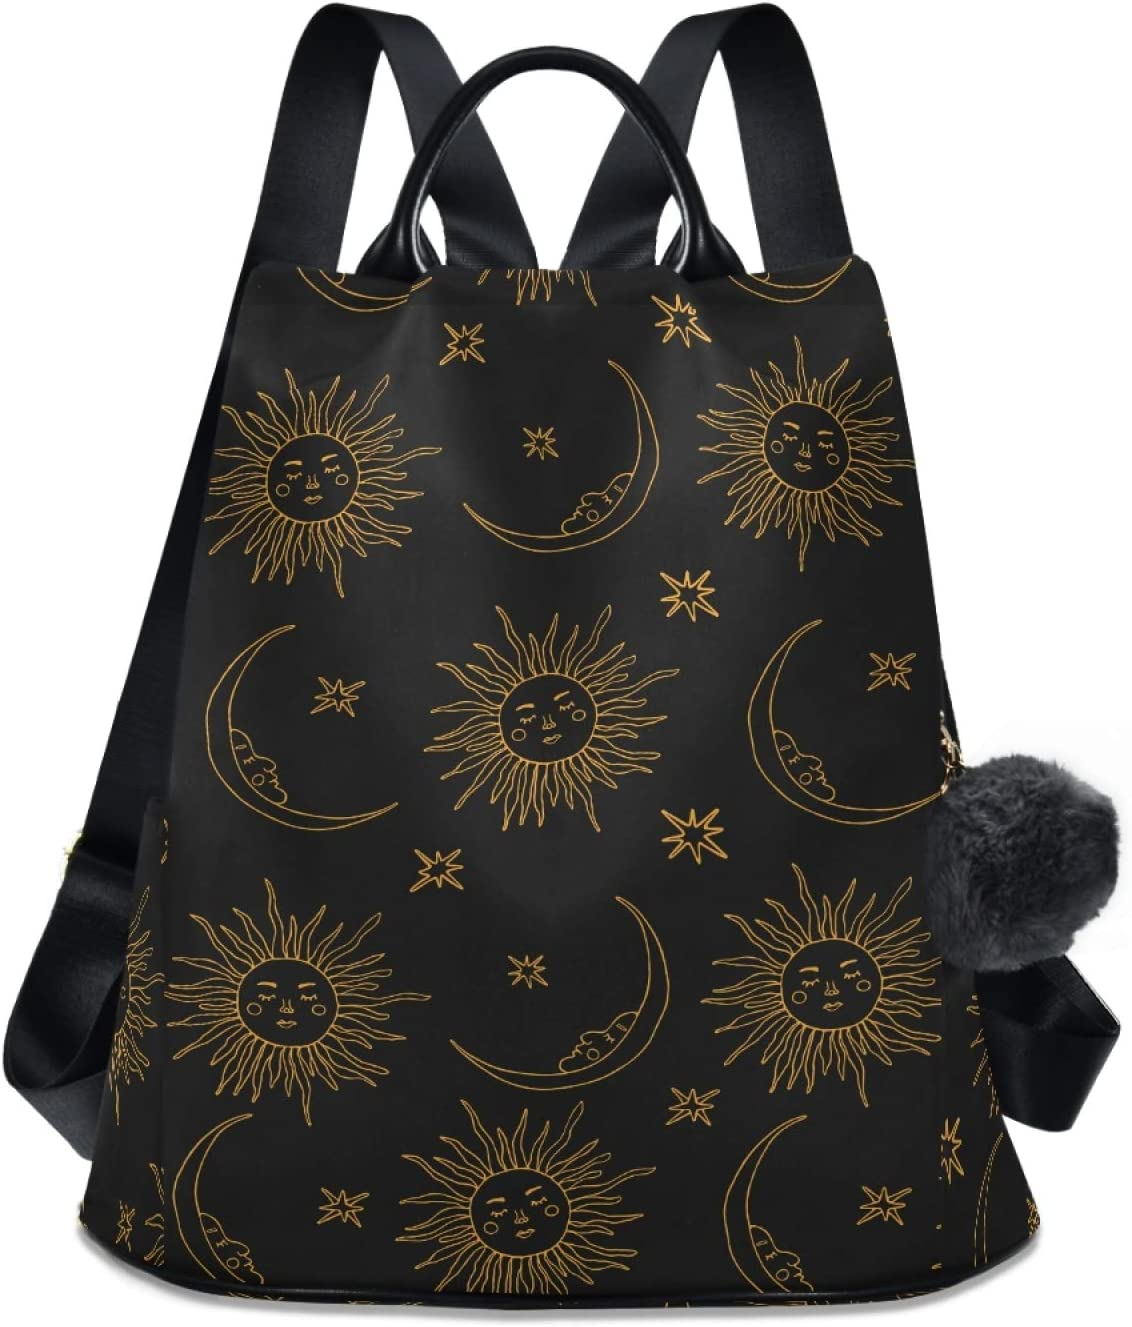 ALAZA 2021 model Boho Bohemian Sun Max 90% OFF Moon Backpack for Purse Anti Women Theft